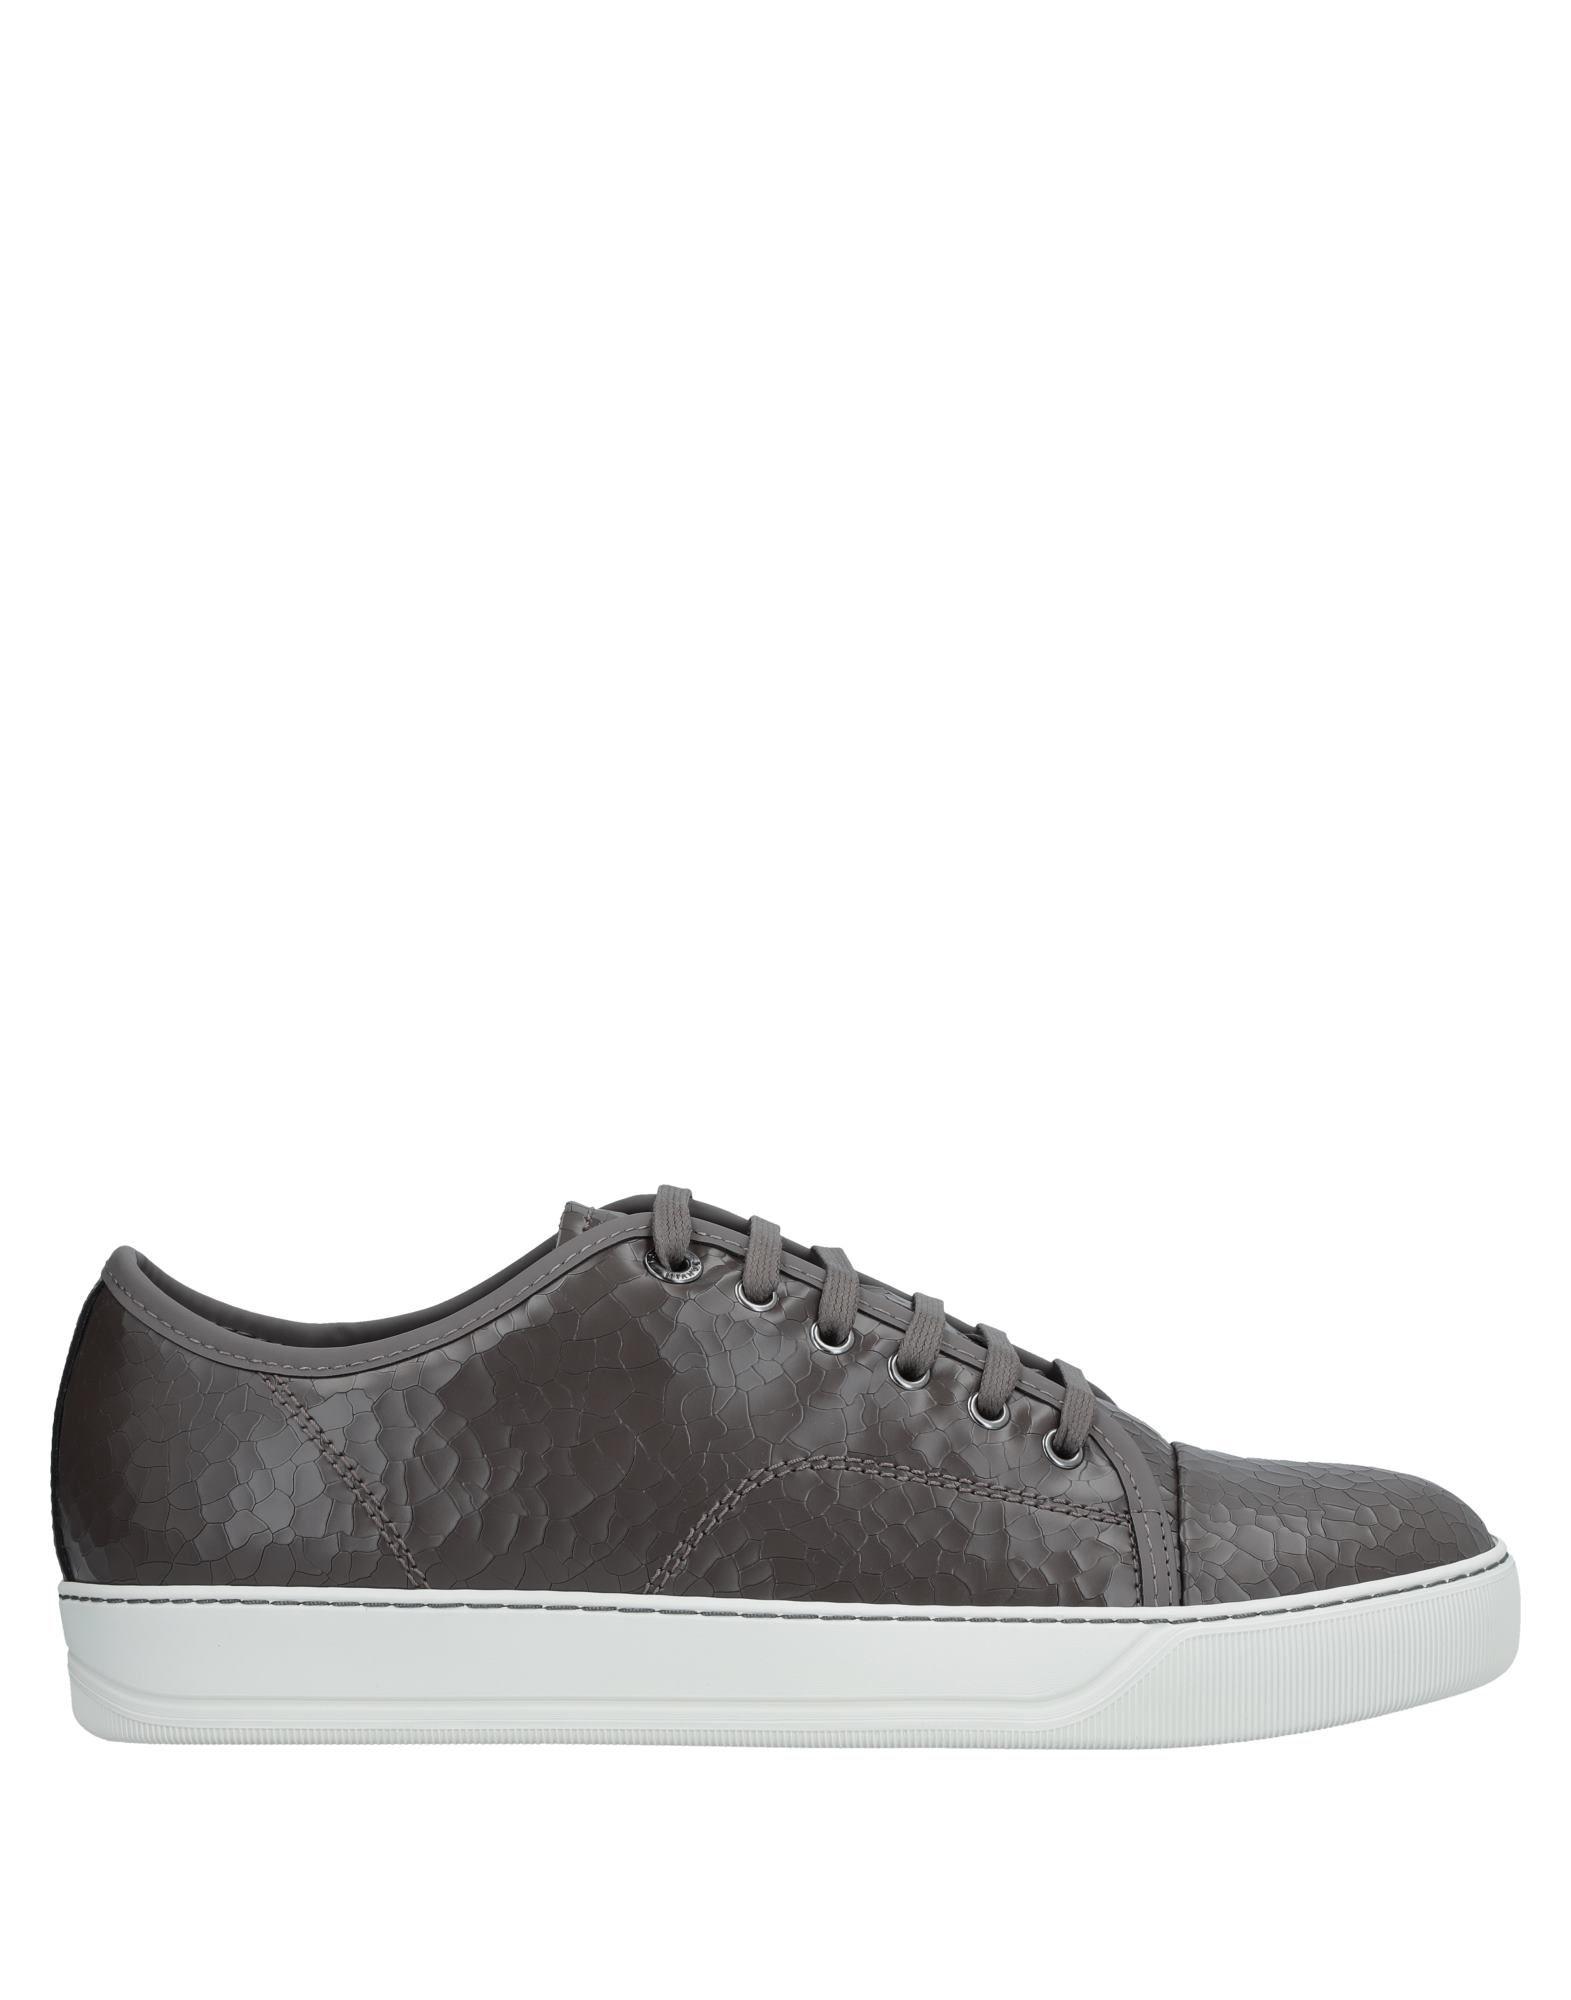 Lanvin Sneakers Herren  11538079NA Gute Qualität beliebte Schuhe